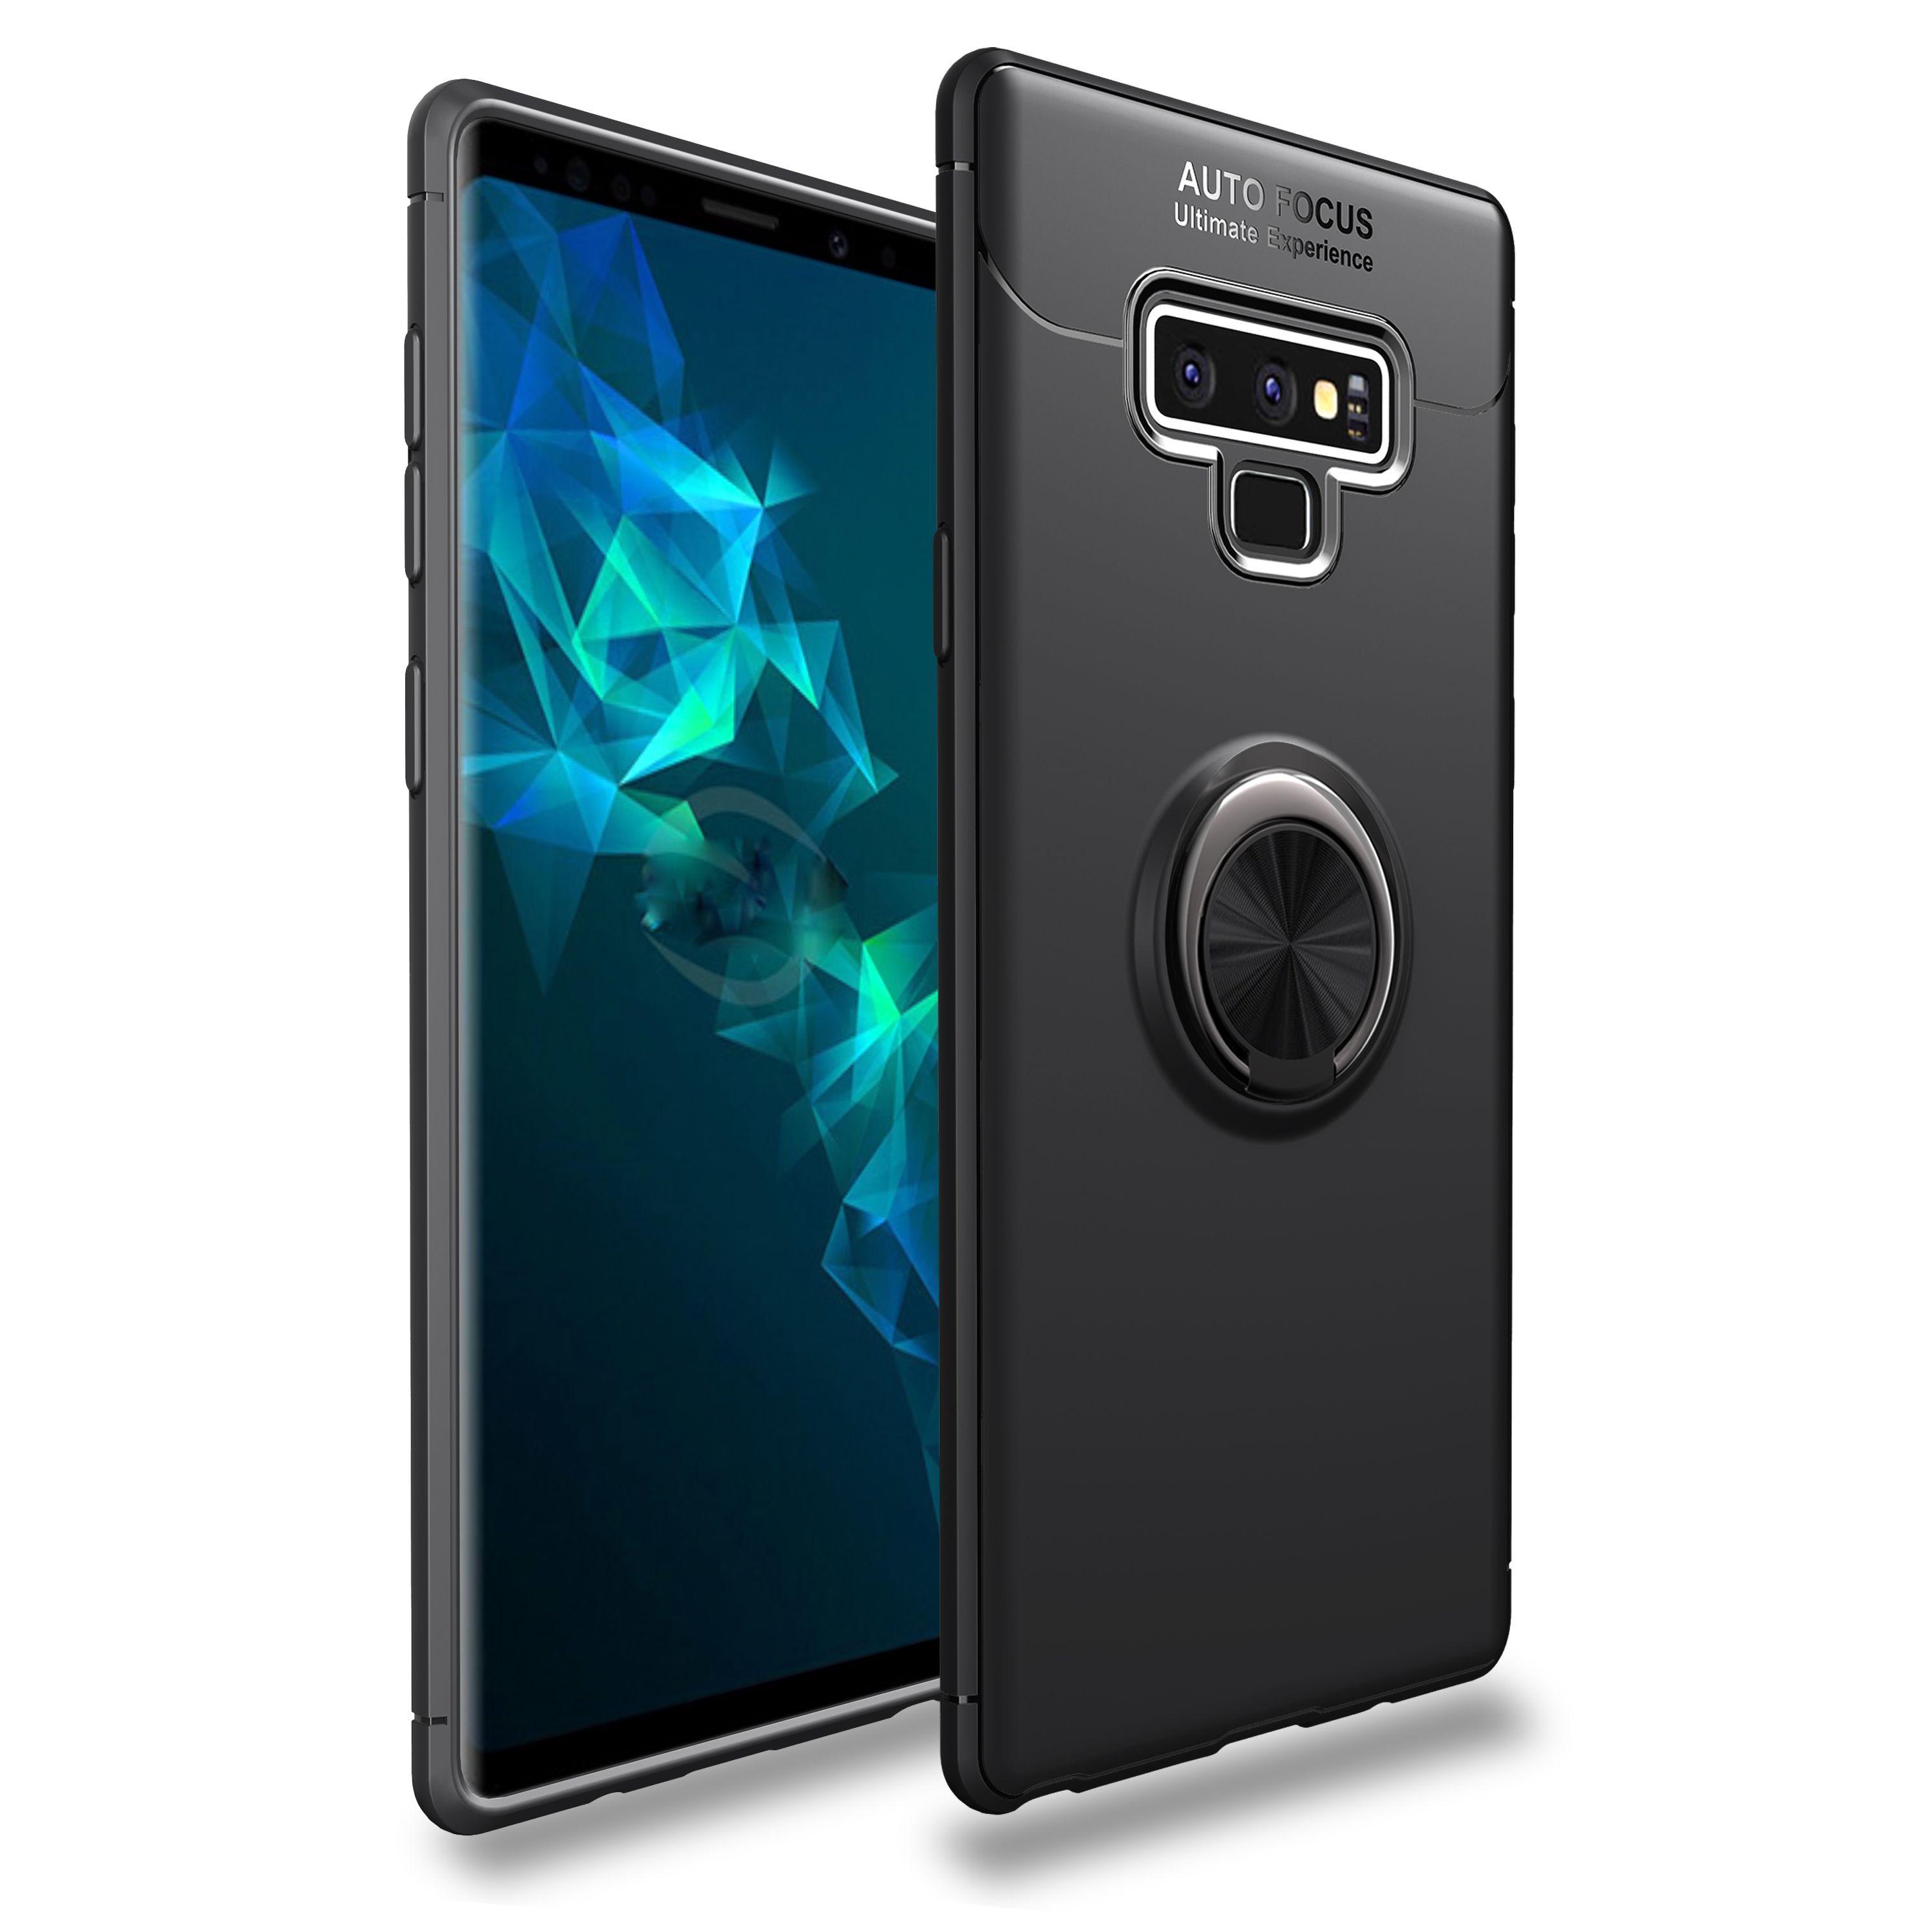 Ultra Slim Thin Finger Ring Kickstand Soft Case For Samsung Galaxy Note 9 S9 S9 A6 A6 J8 J6 J4 S8 S8 Note8